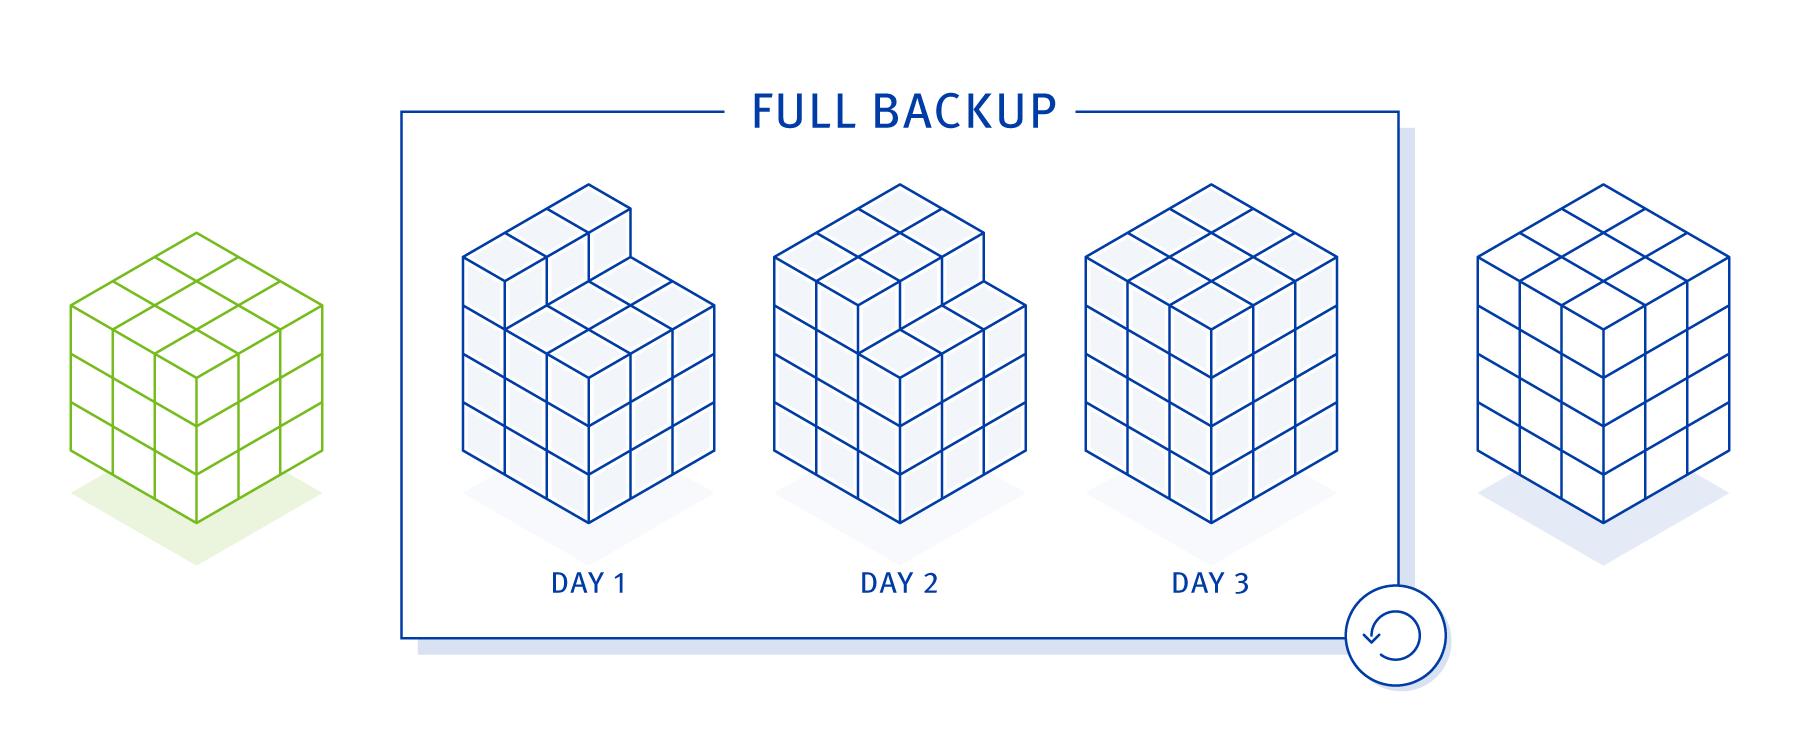 backup strategy - full backup